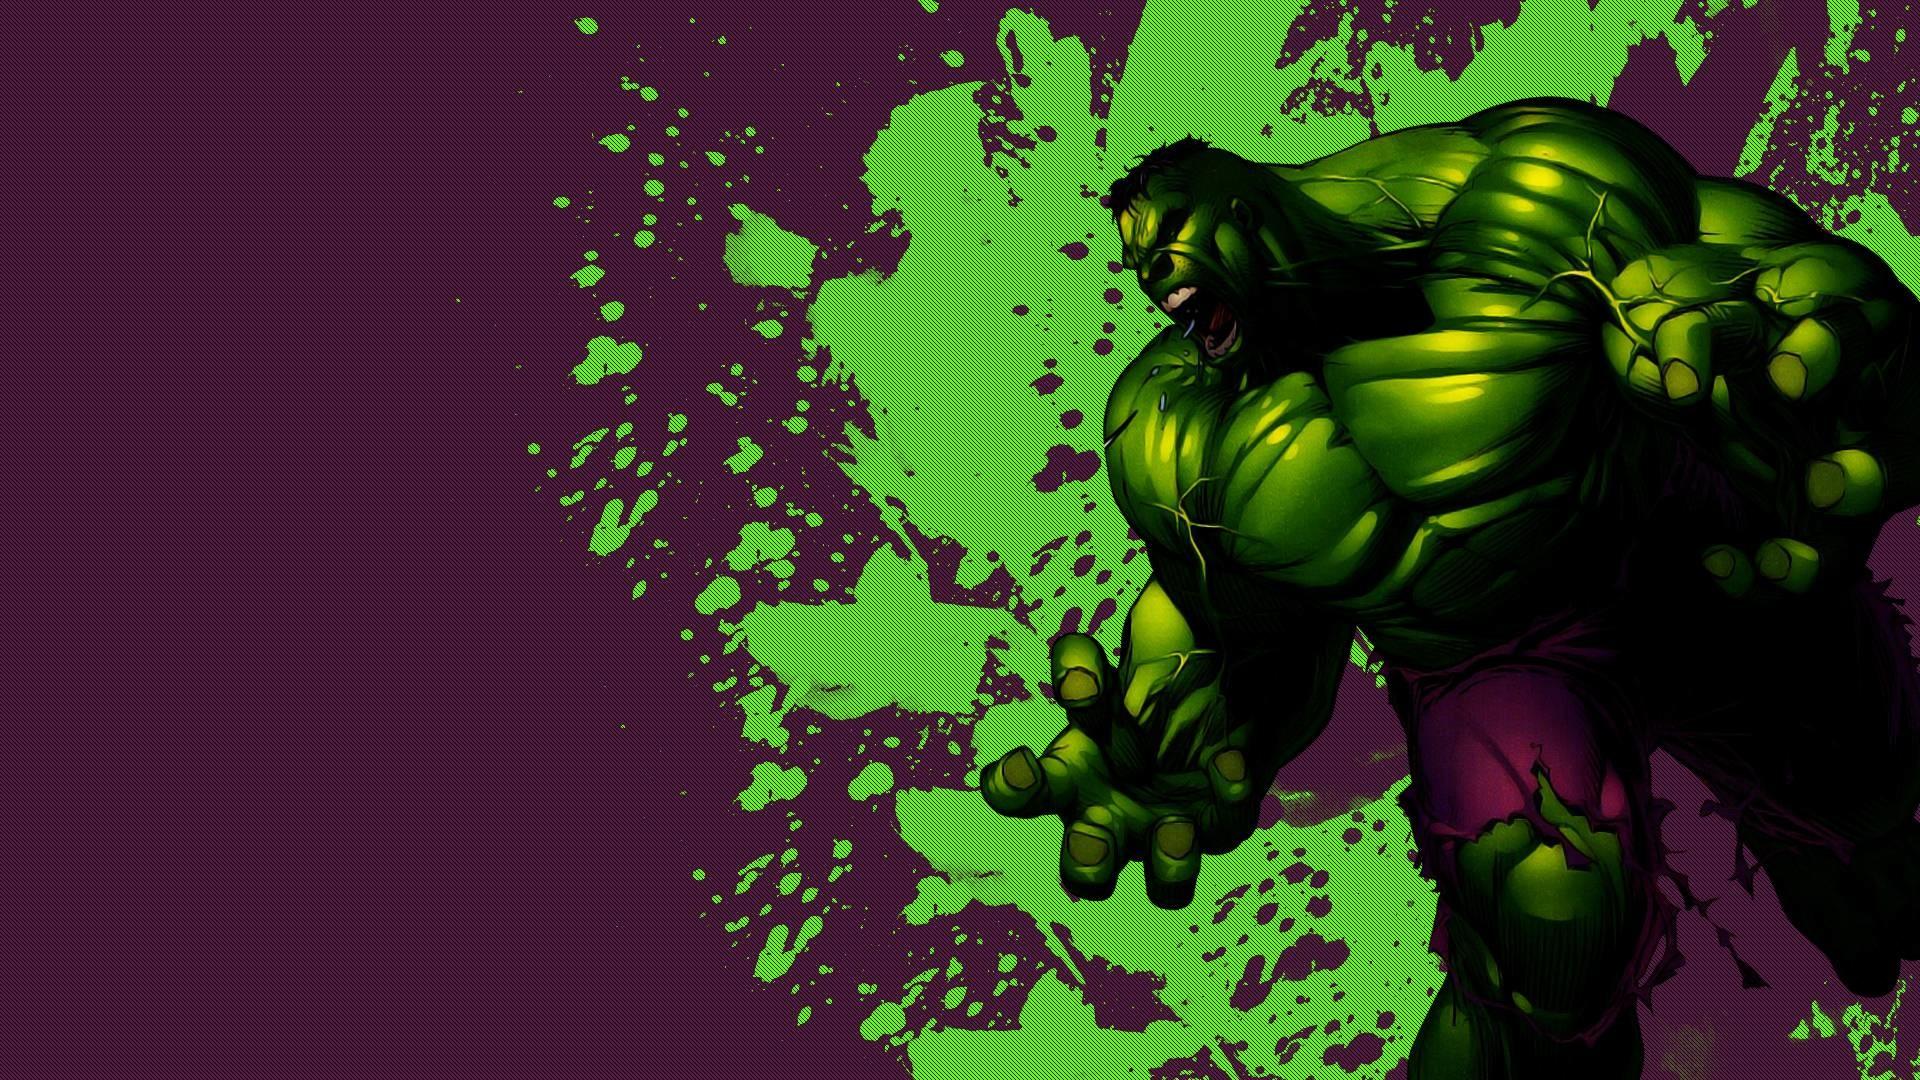 Hulk Wallpaper 2 259113 Images HD Wallpapers| Wallfoy.com